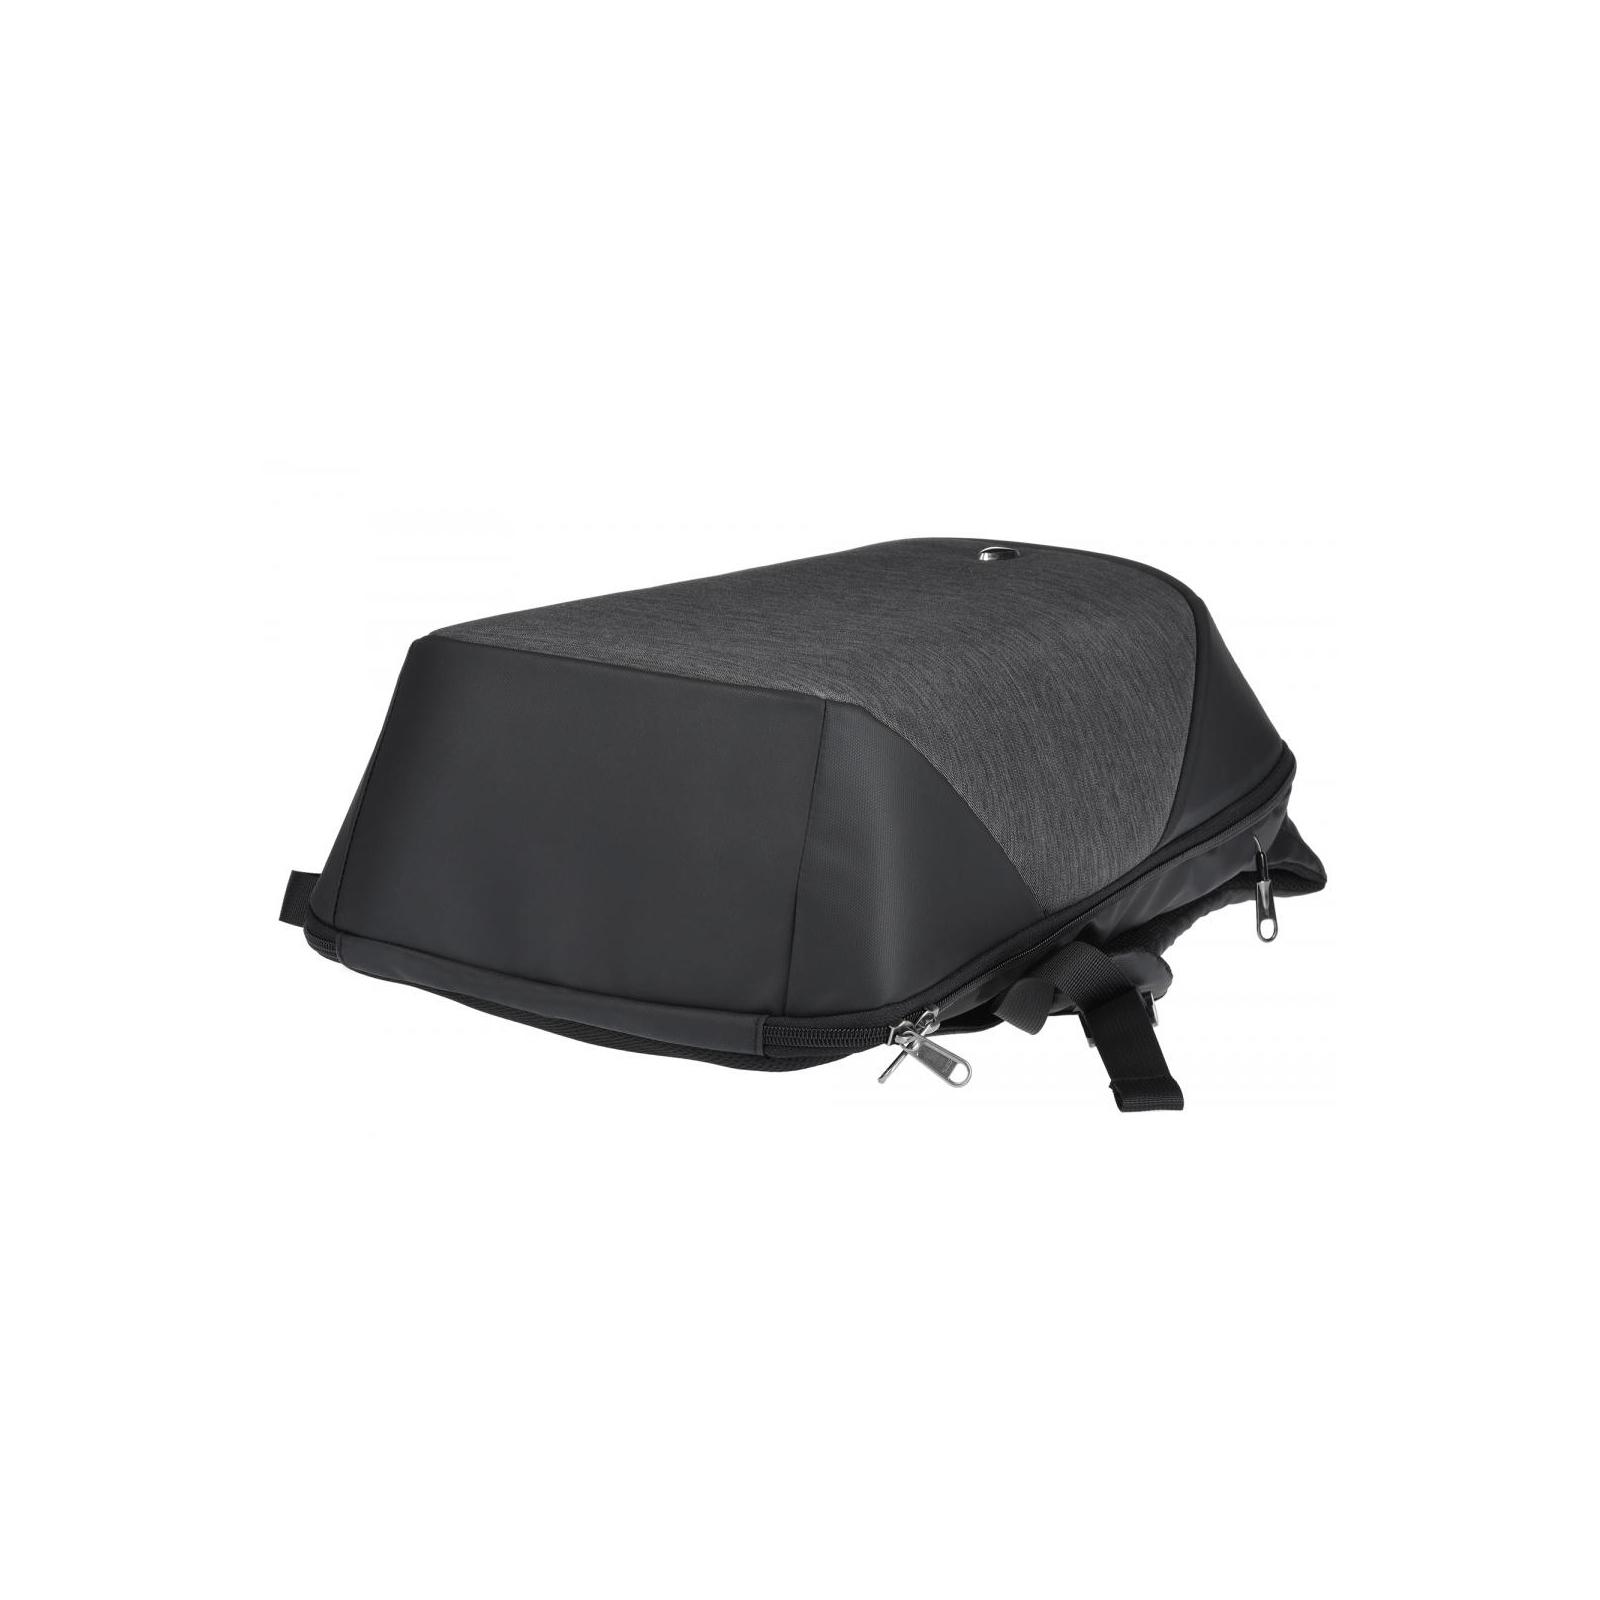 "Рюкзак для ноутбука 2E 16"" BPK63148 Black (2E-BPK63148BK) изображение 4"